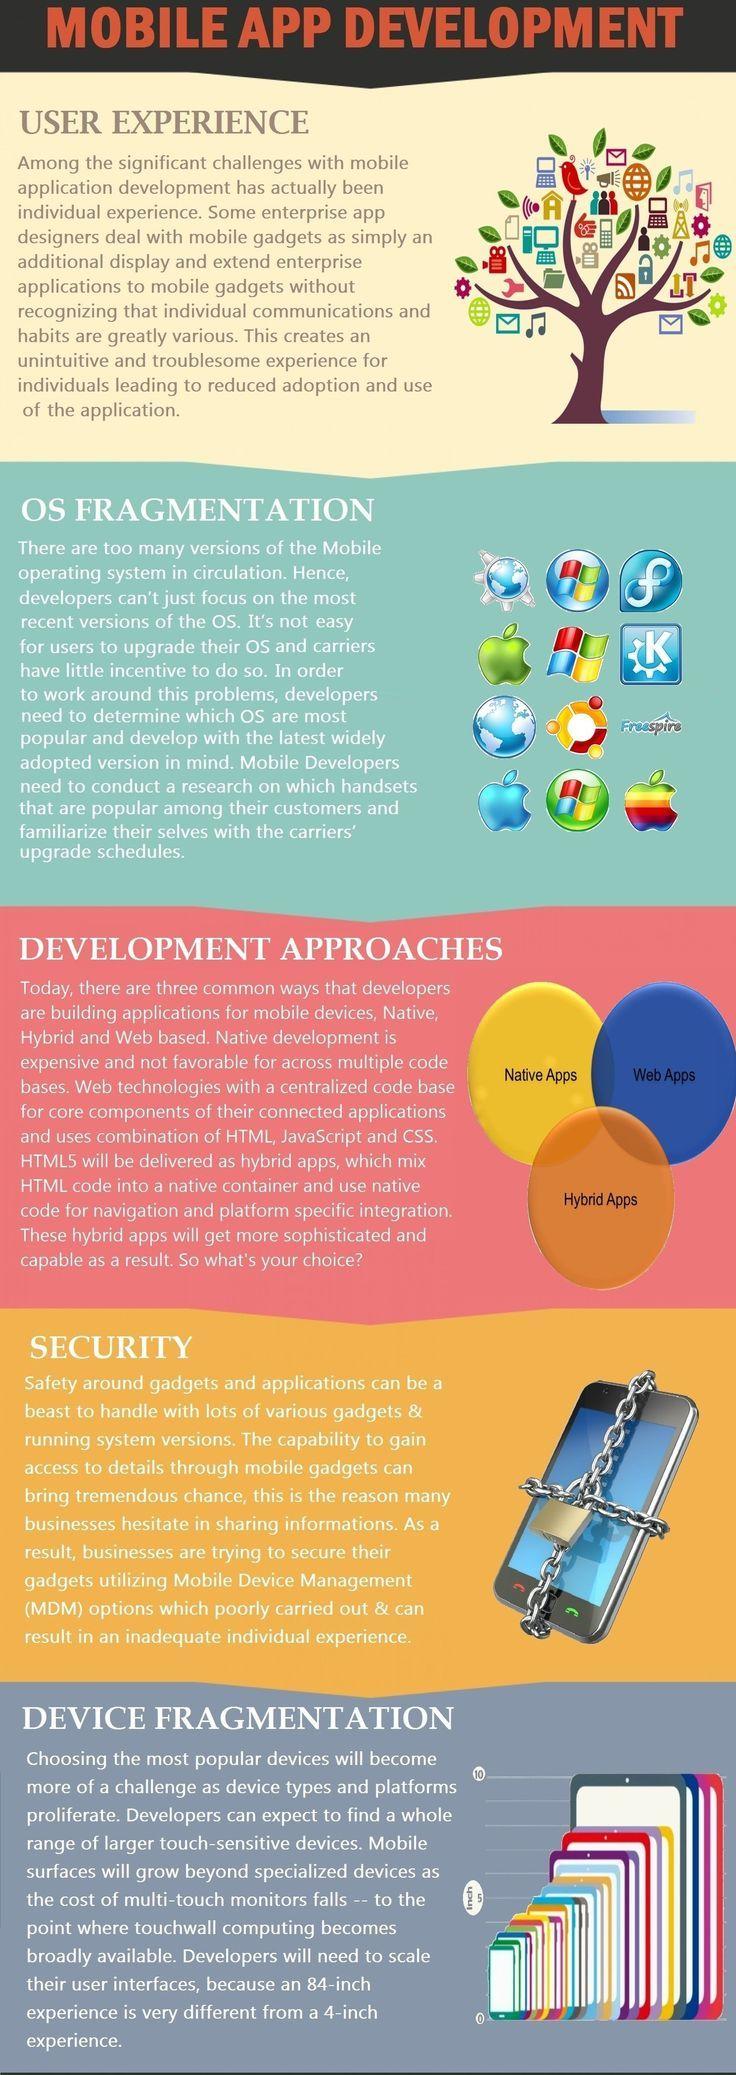 #Mobile_application_development http://immortal-technologies.com/web-applications-development.html #APPLICATIONDEVELOPMENT #APPLICATION